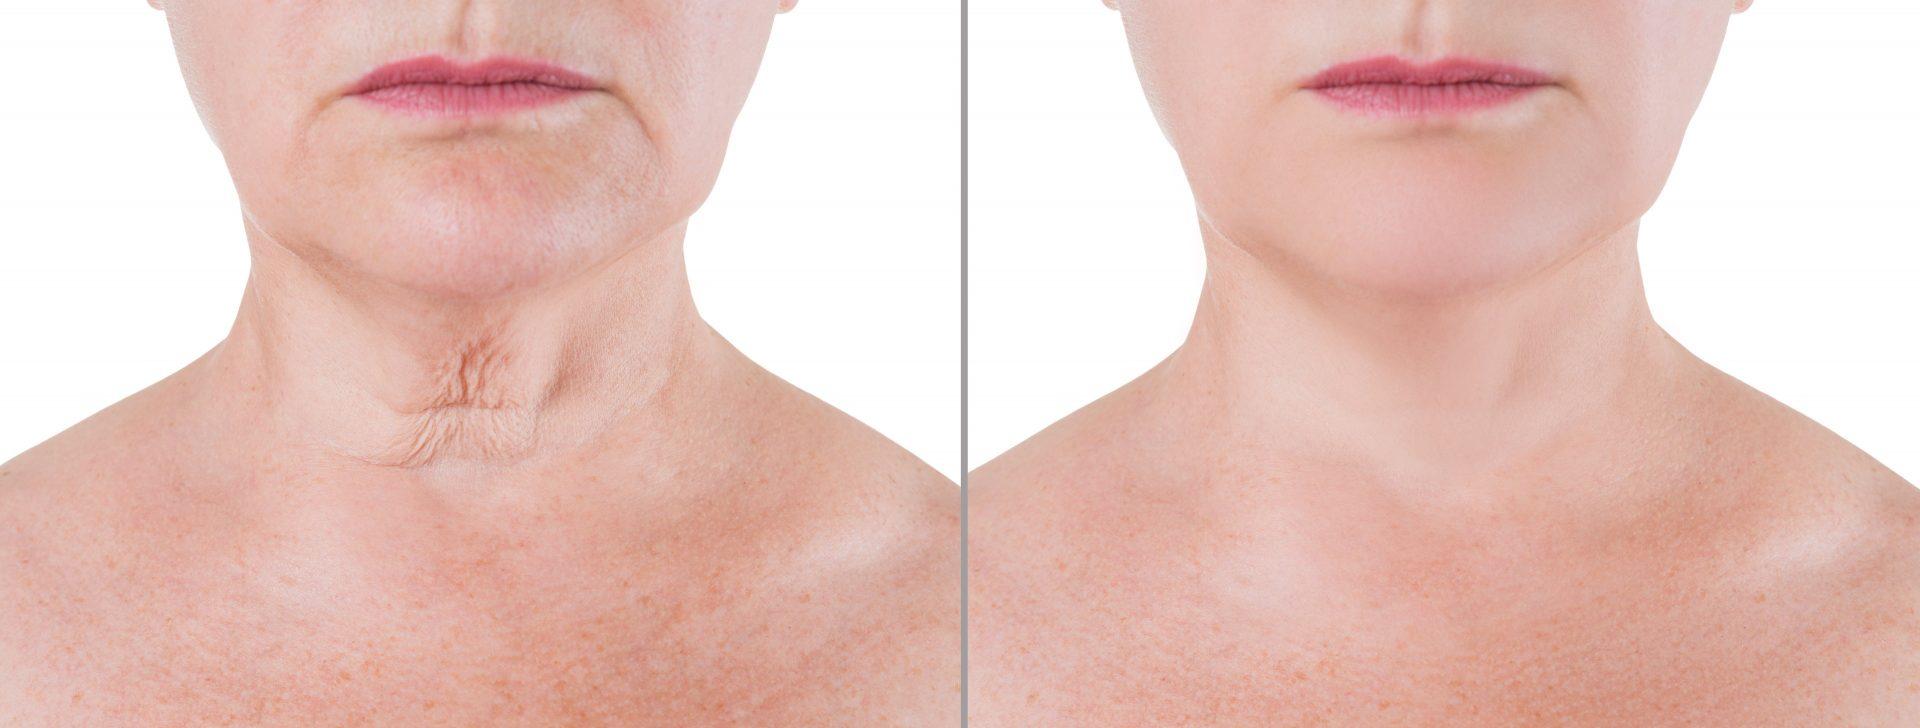 Radiofrecuencia facial cuello